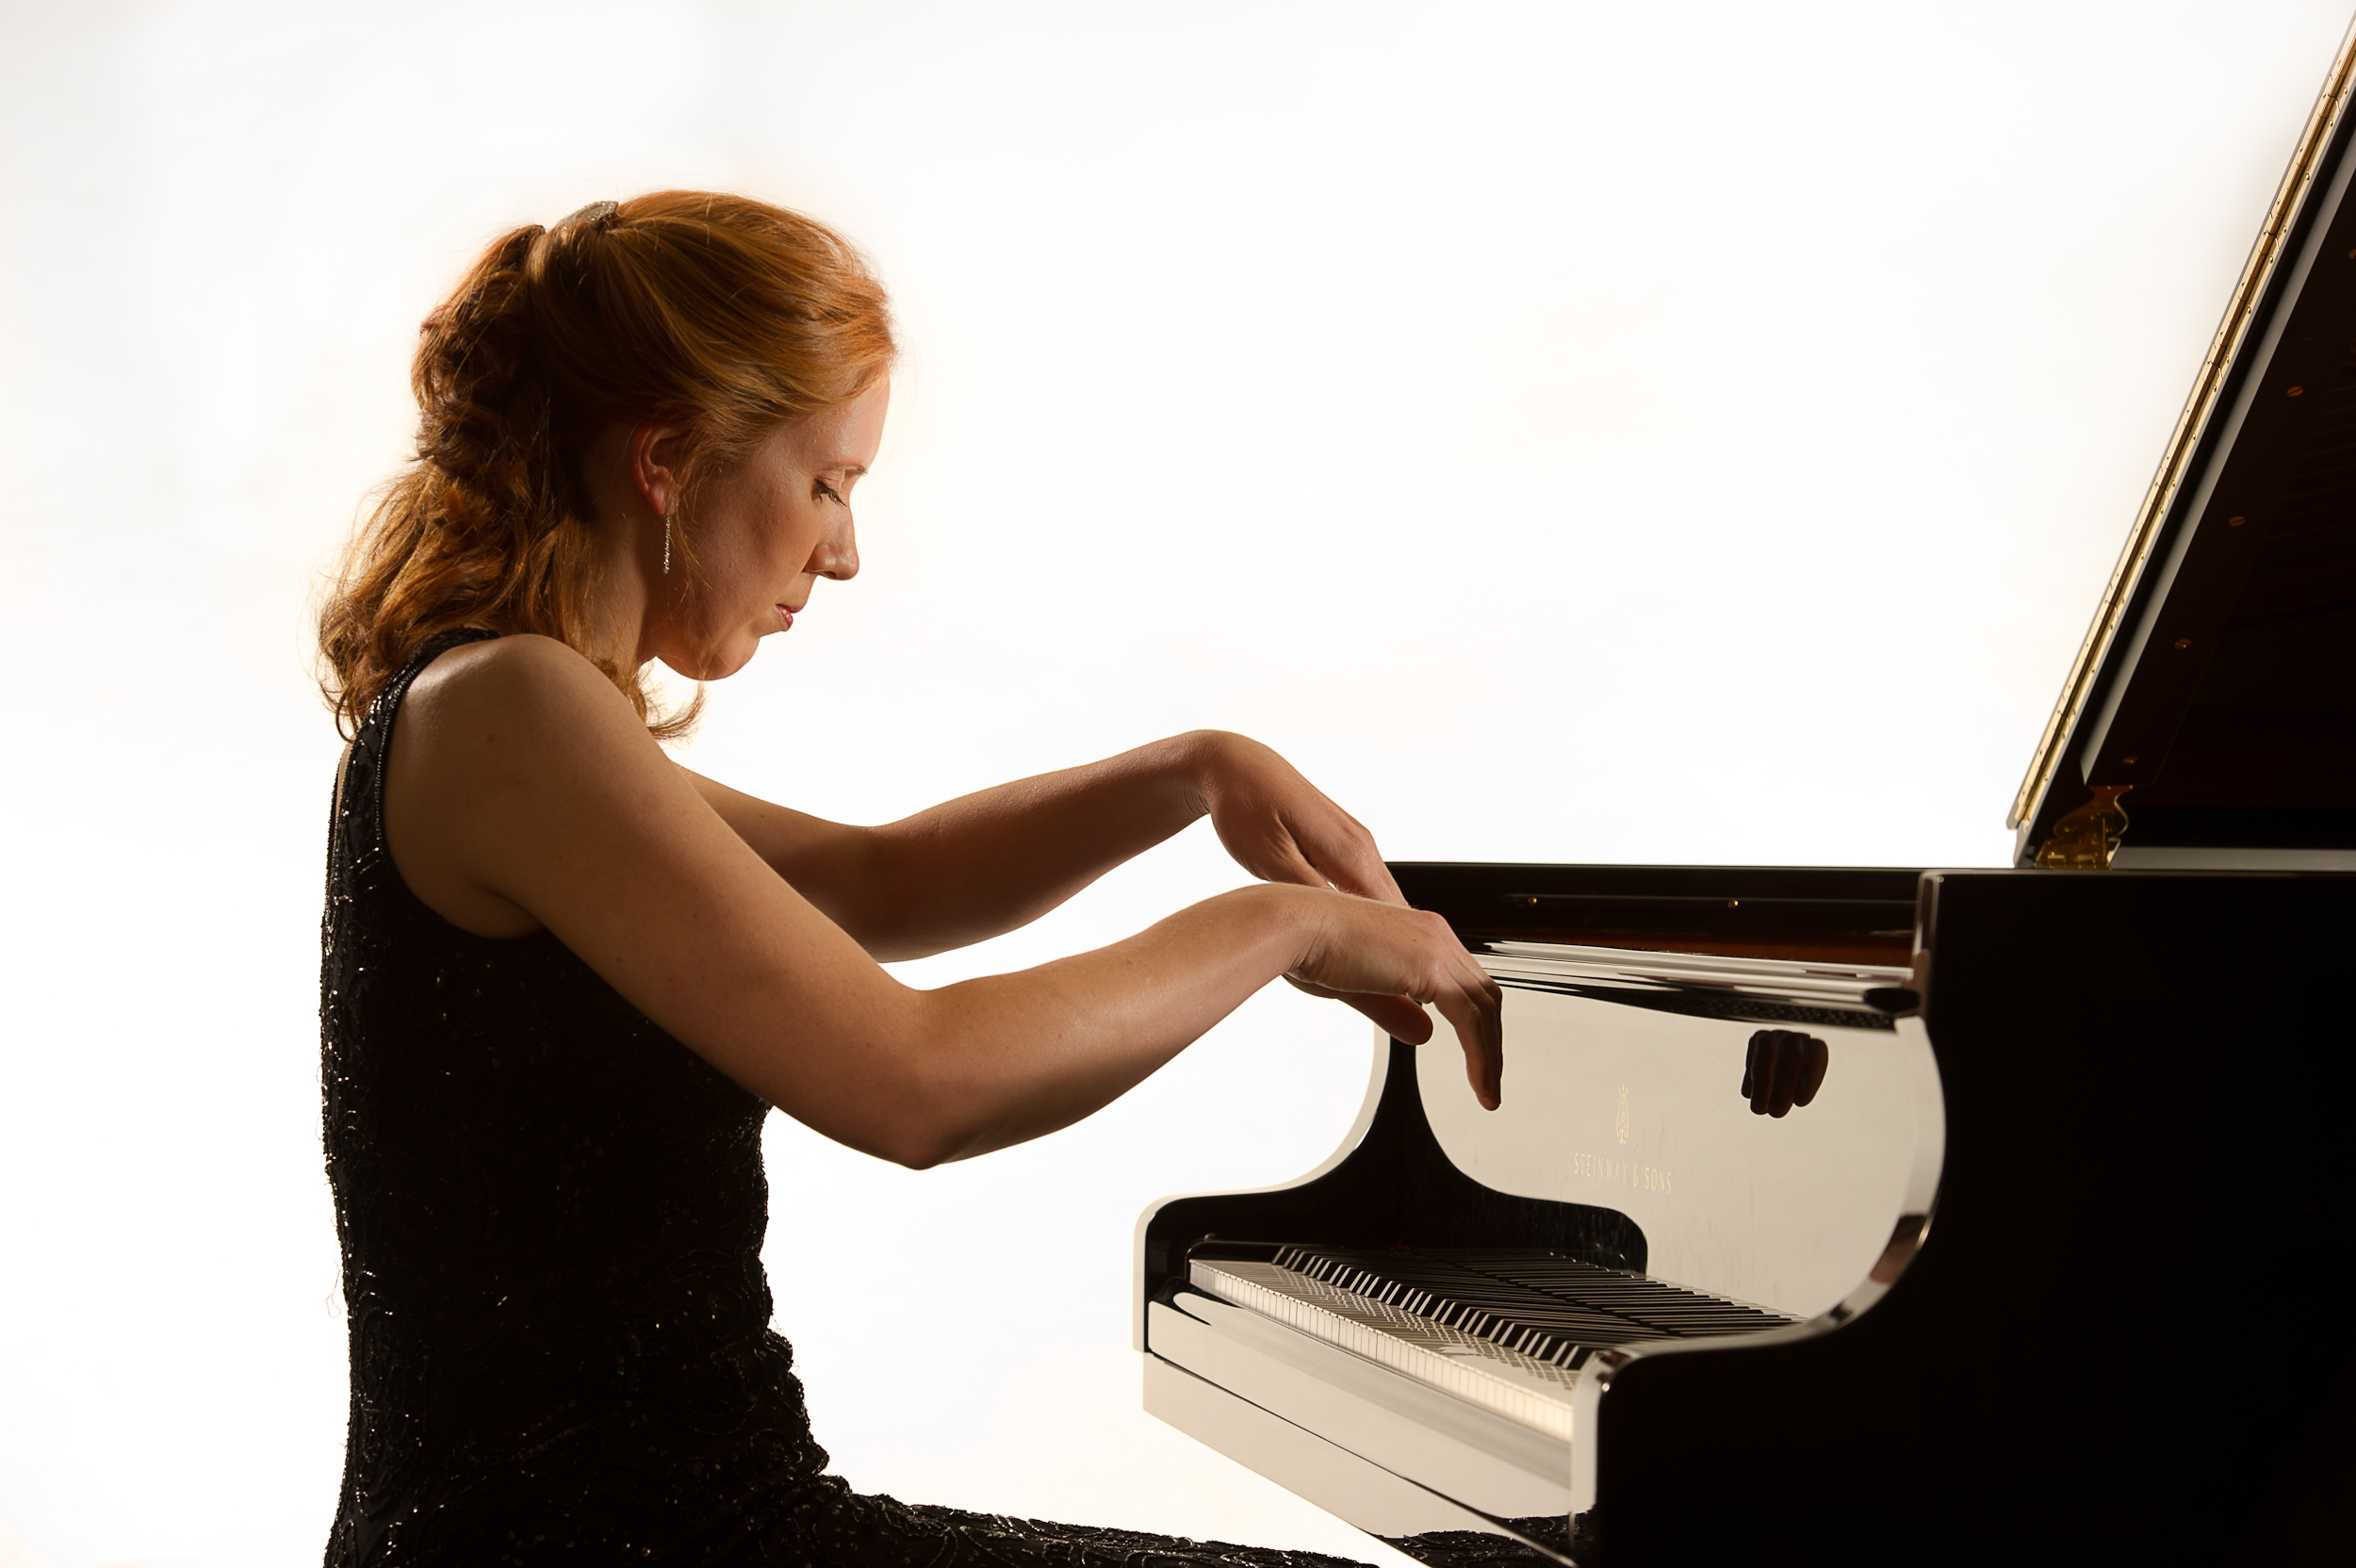 Sarah Beth Briggs playing the piano